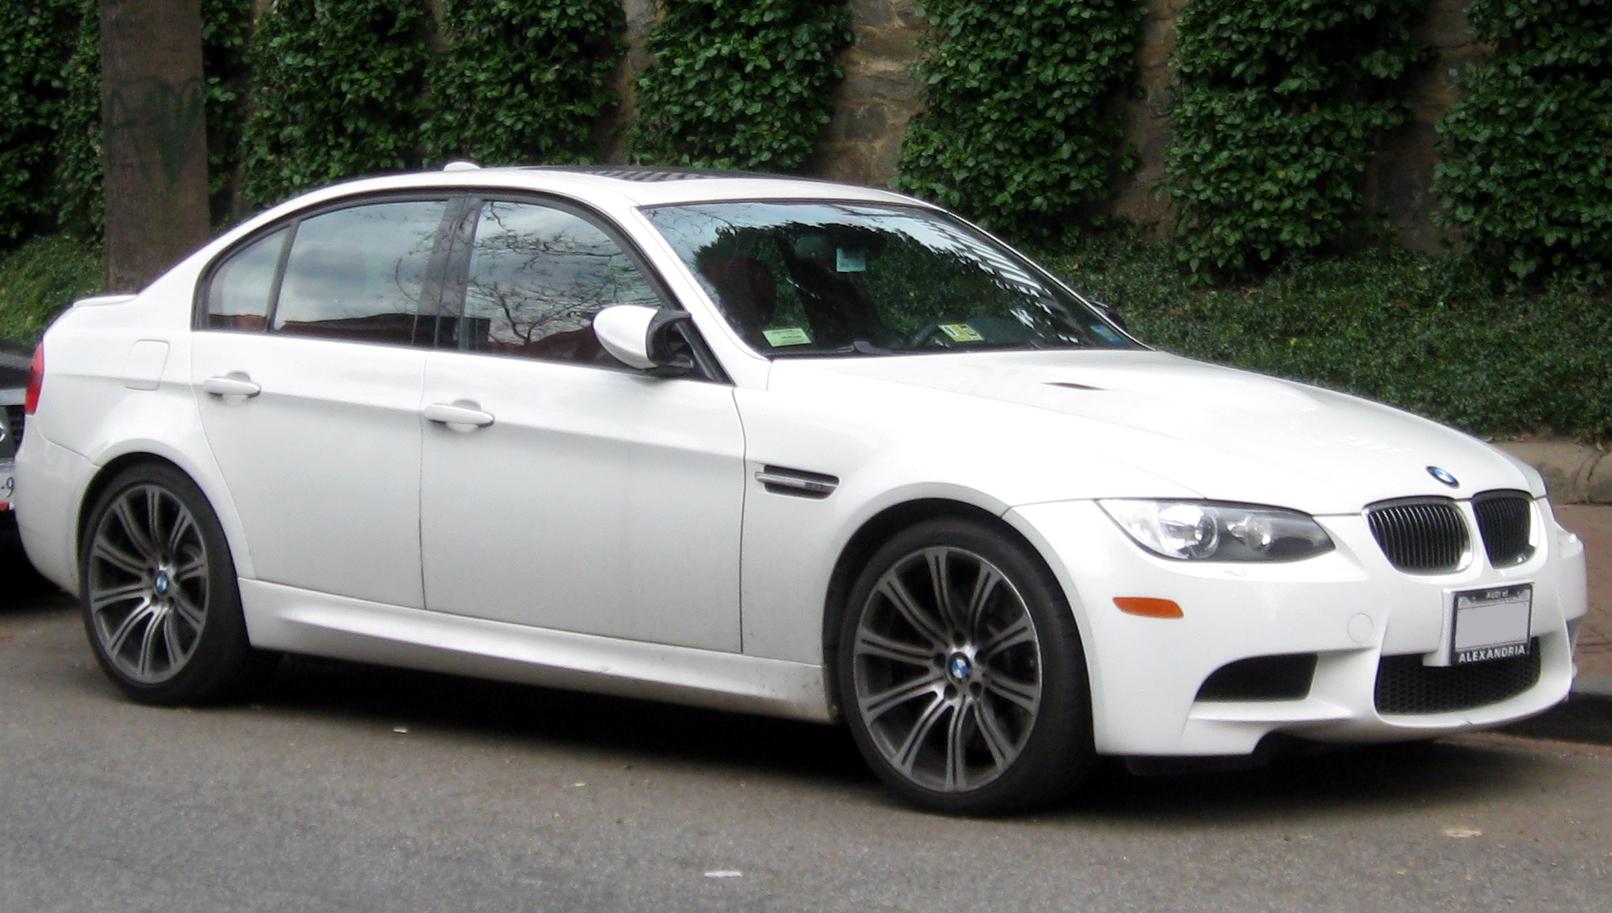 File:2009-2011 BMW M3 sedan -- 01-07-2012.jpg - Wikimedia Commons